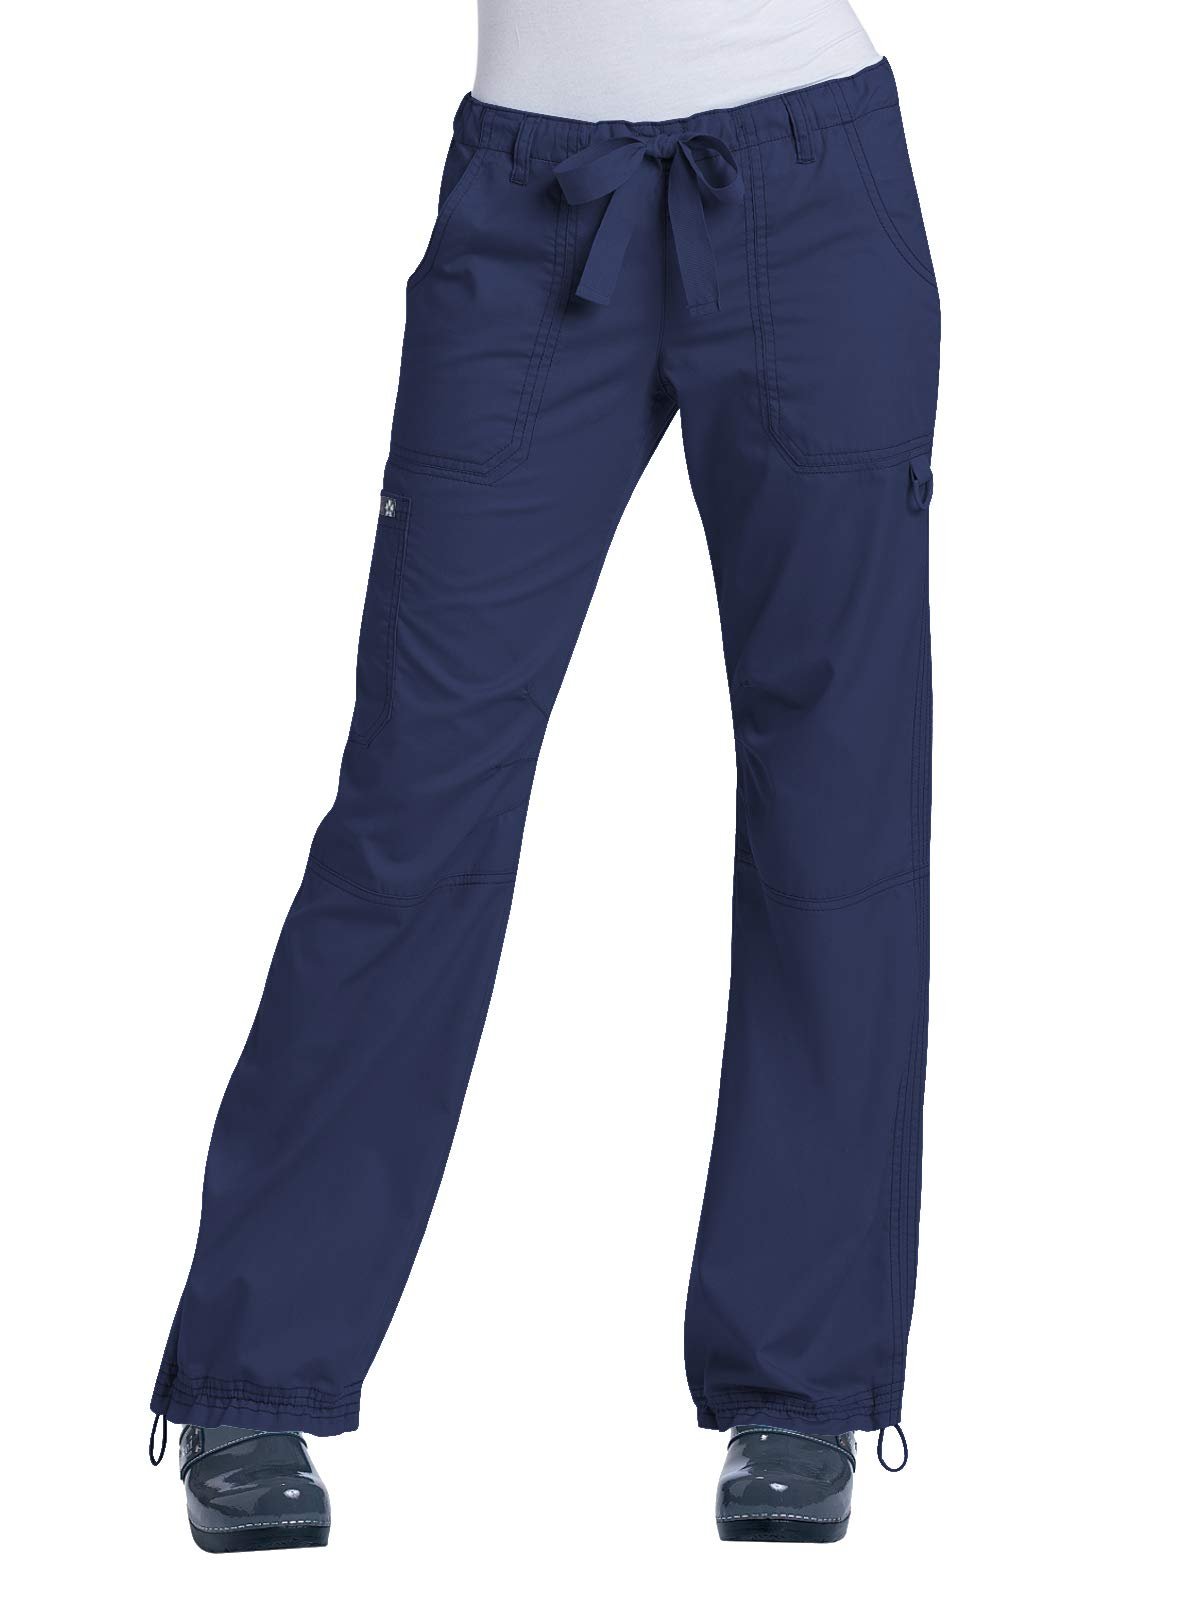 KOI Classics 701 Women's Lindsey Scrub Pant Navy M